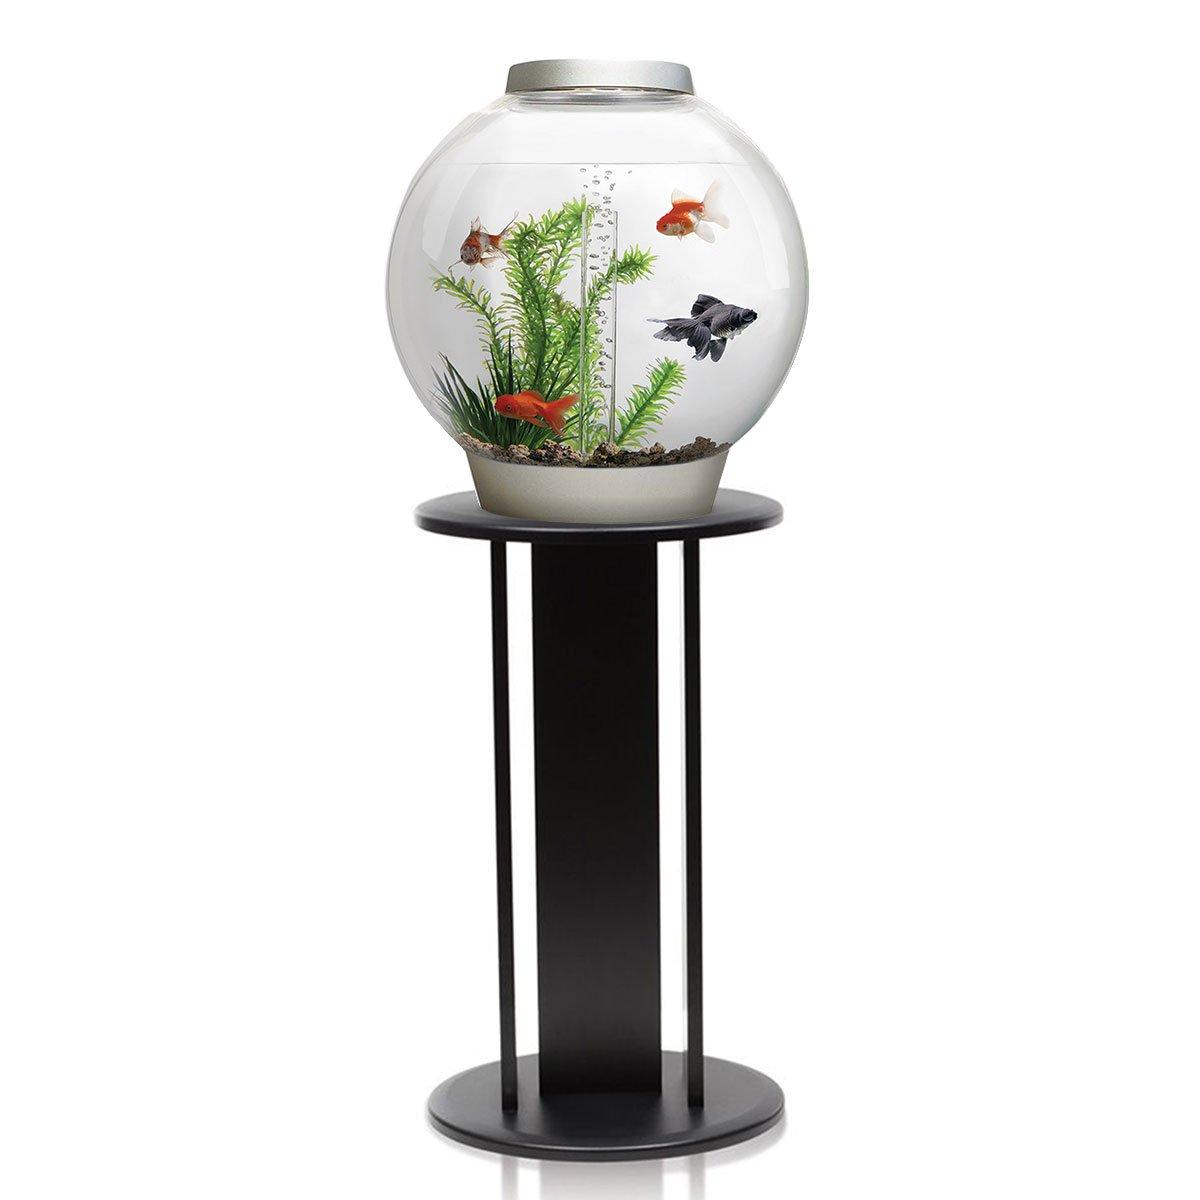 BiOrb Classic 30L Aquarium in Silver with Standard LED Lighting & Black Stand